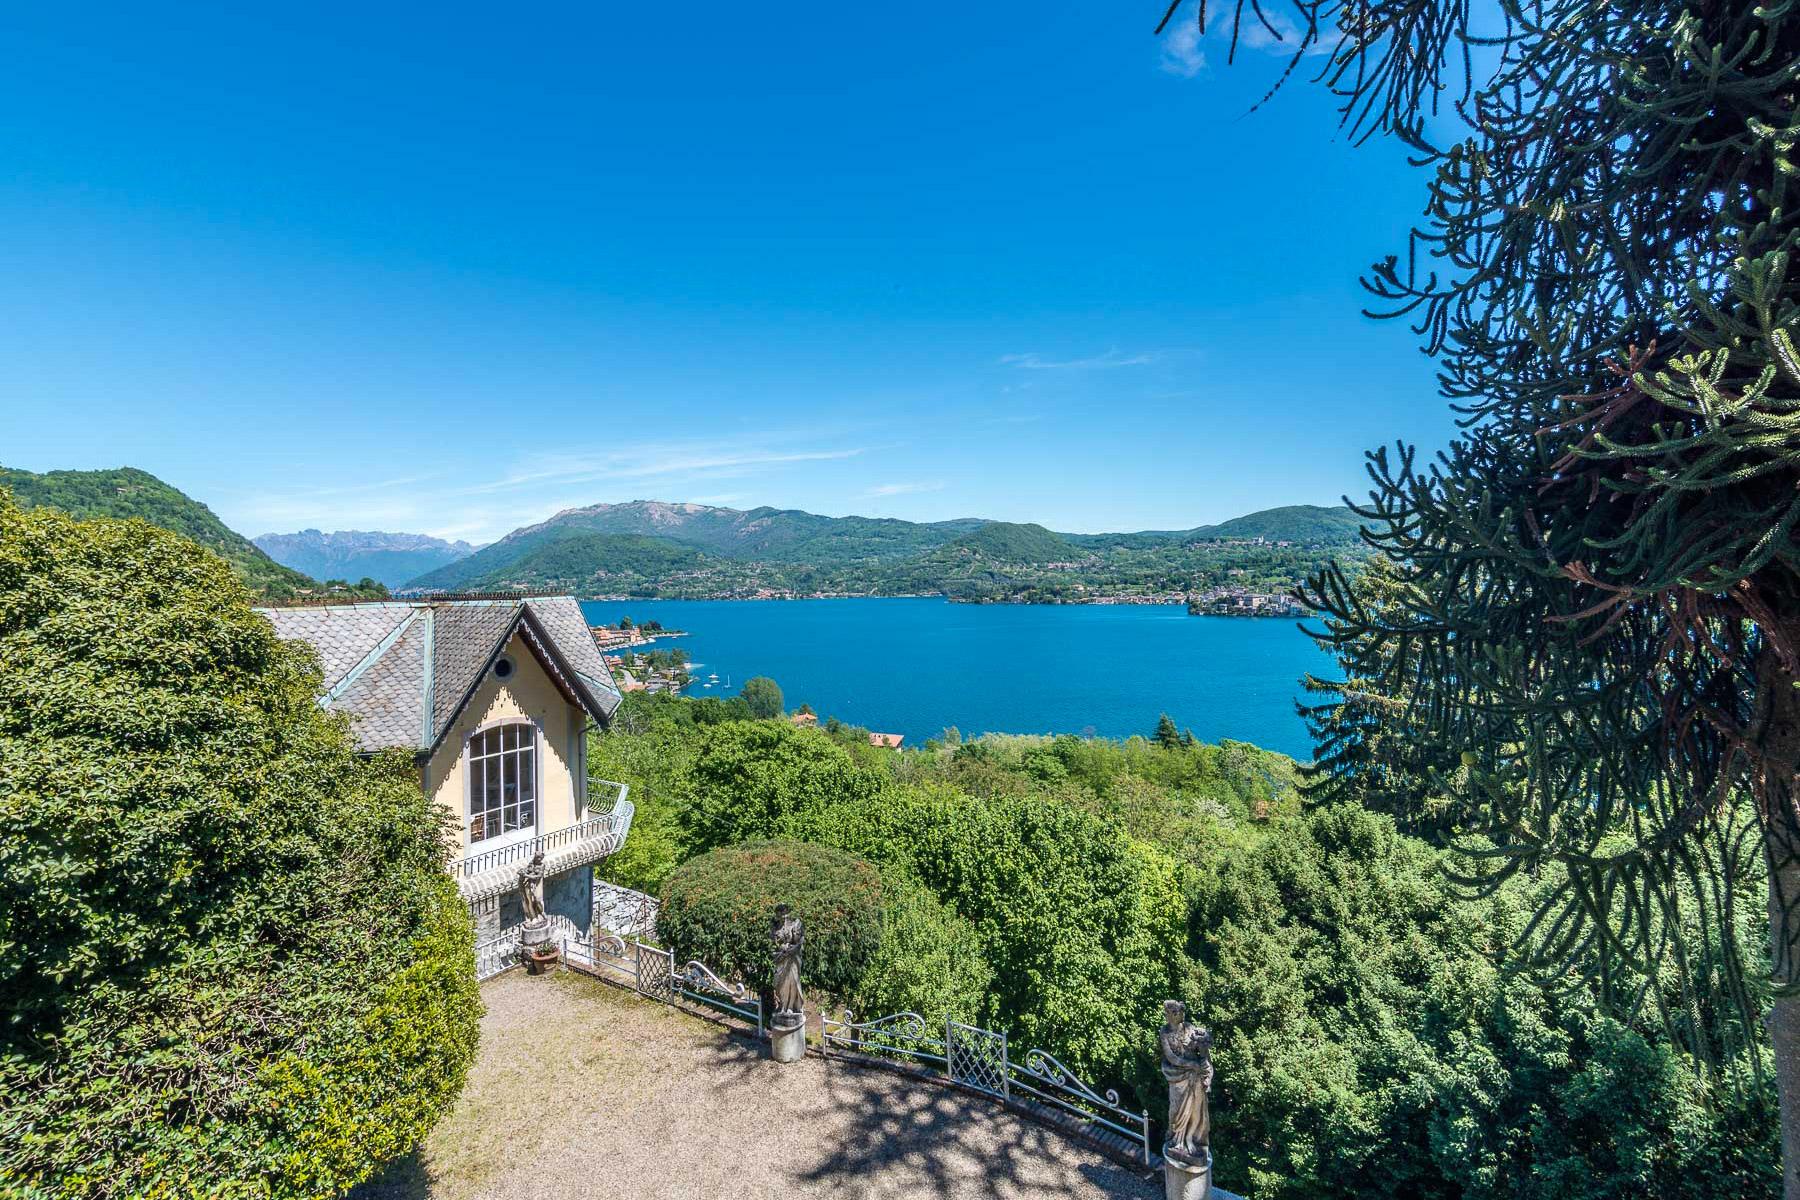 Additional photo for property listing at Enchanting Villa overlooking Orta Lake Via Pietro Durio Pella, Novara 28010 Italien